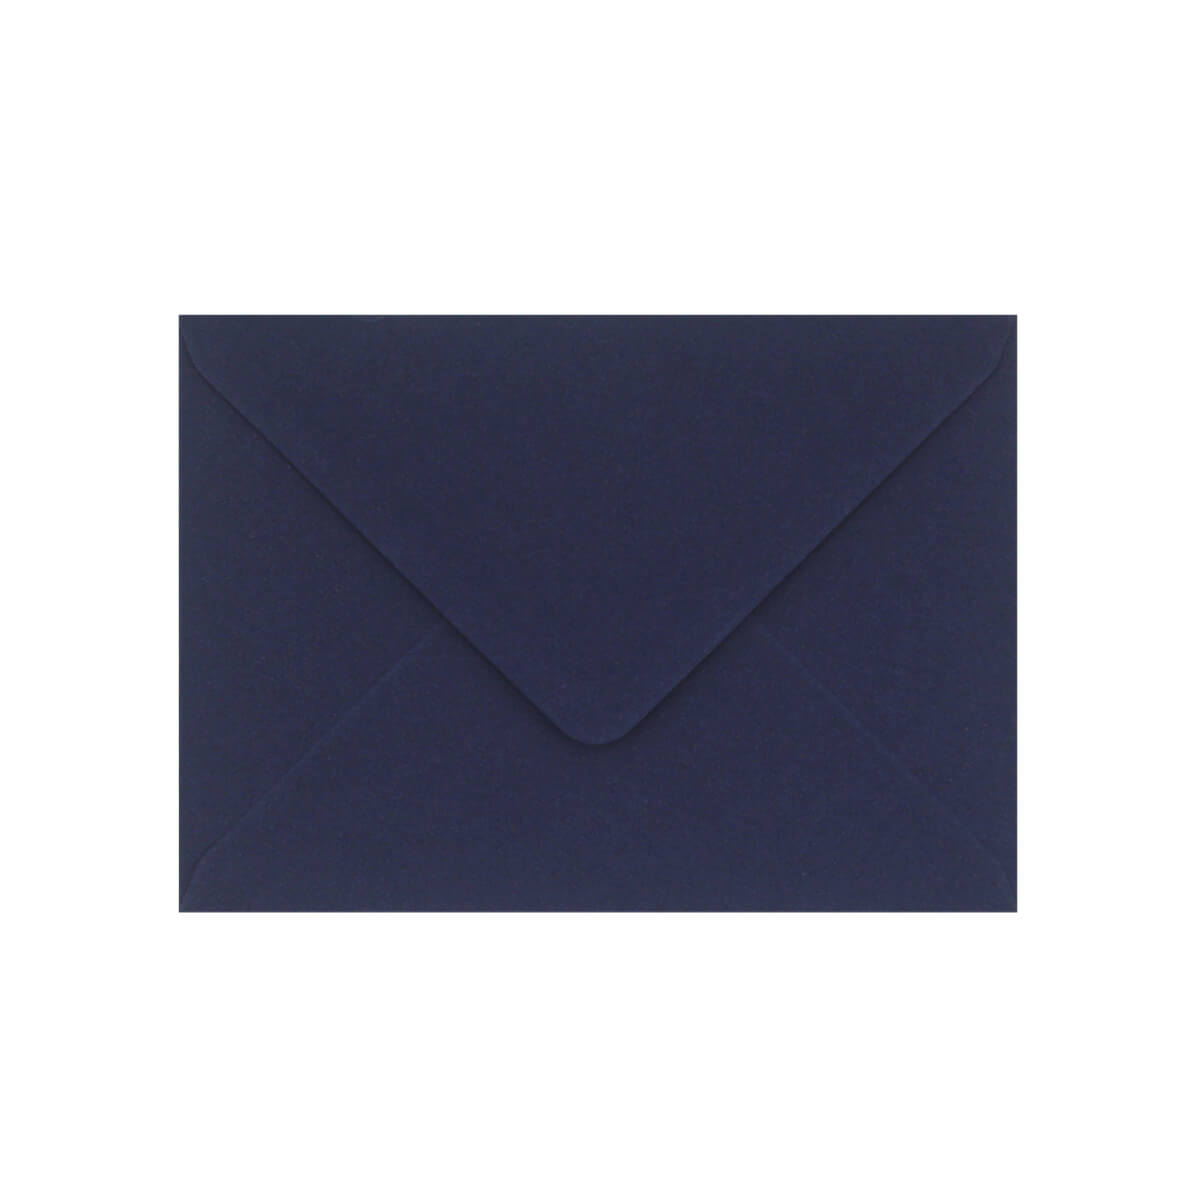 DARK BLUE 125 x 175mm ENVELOPES